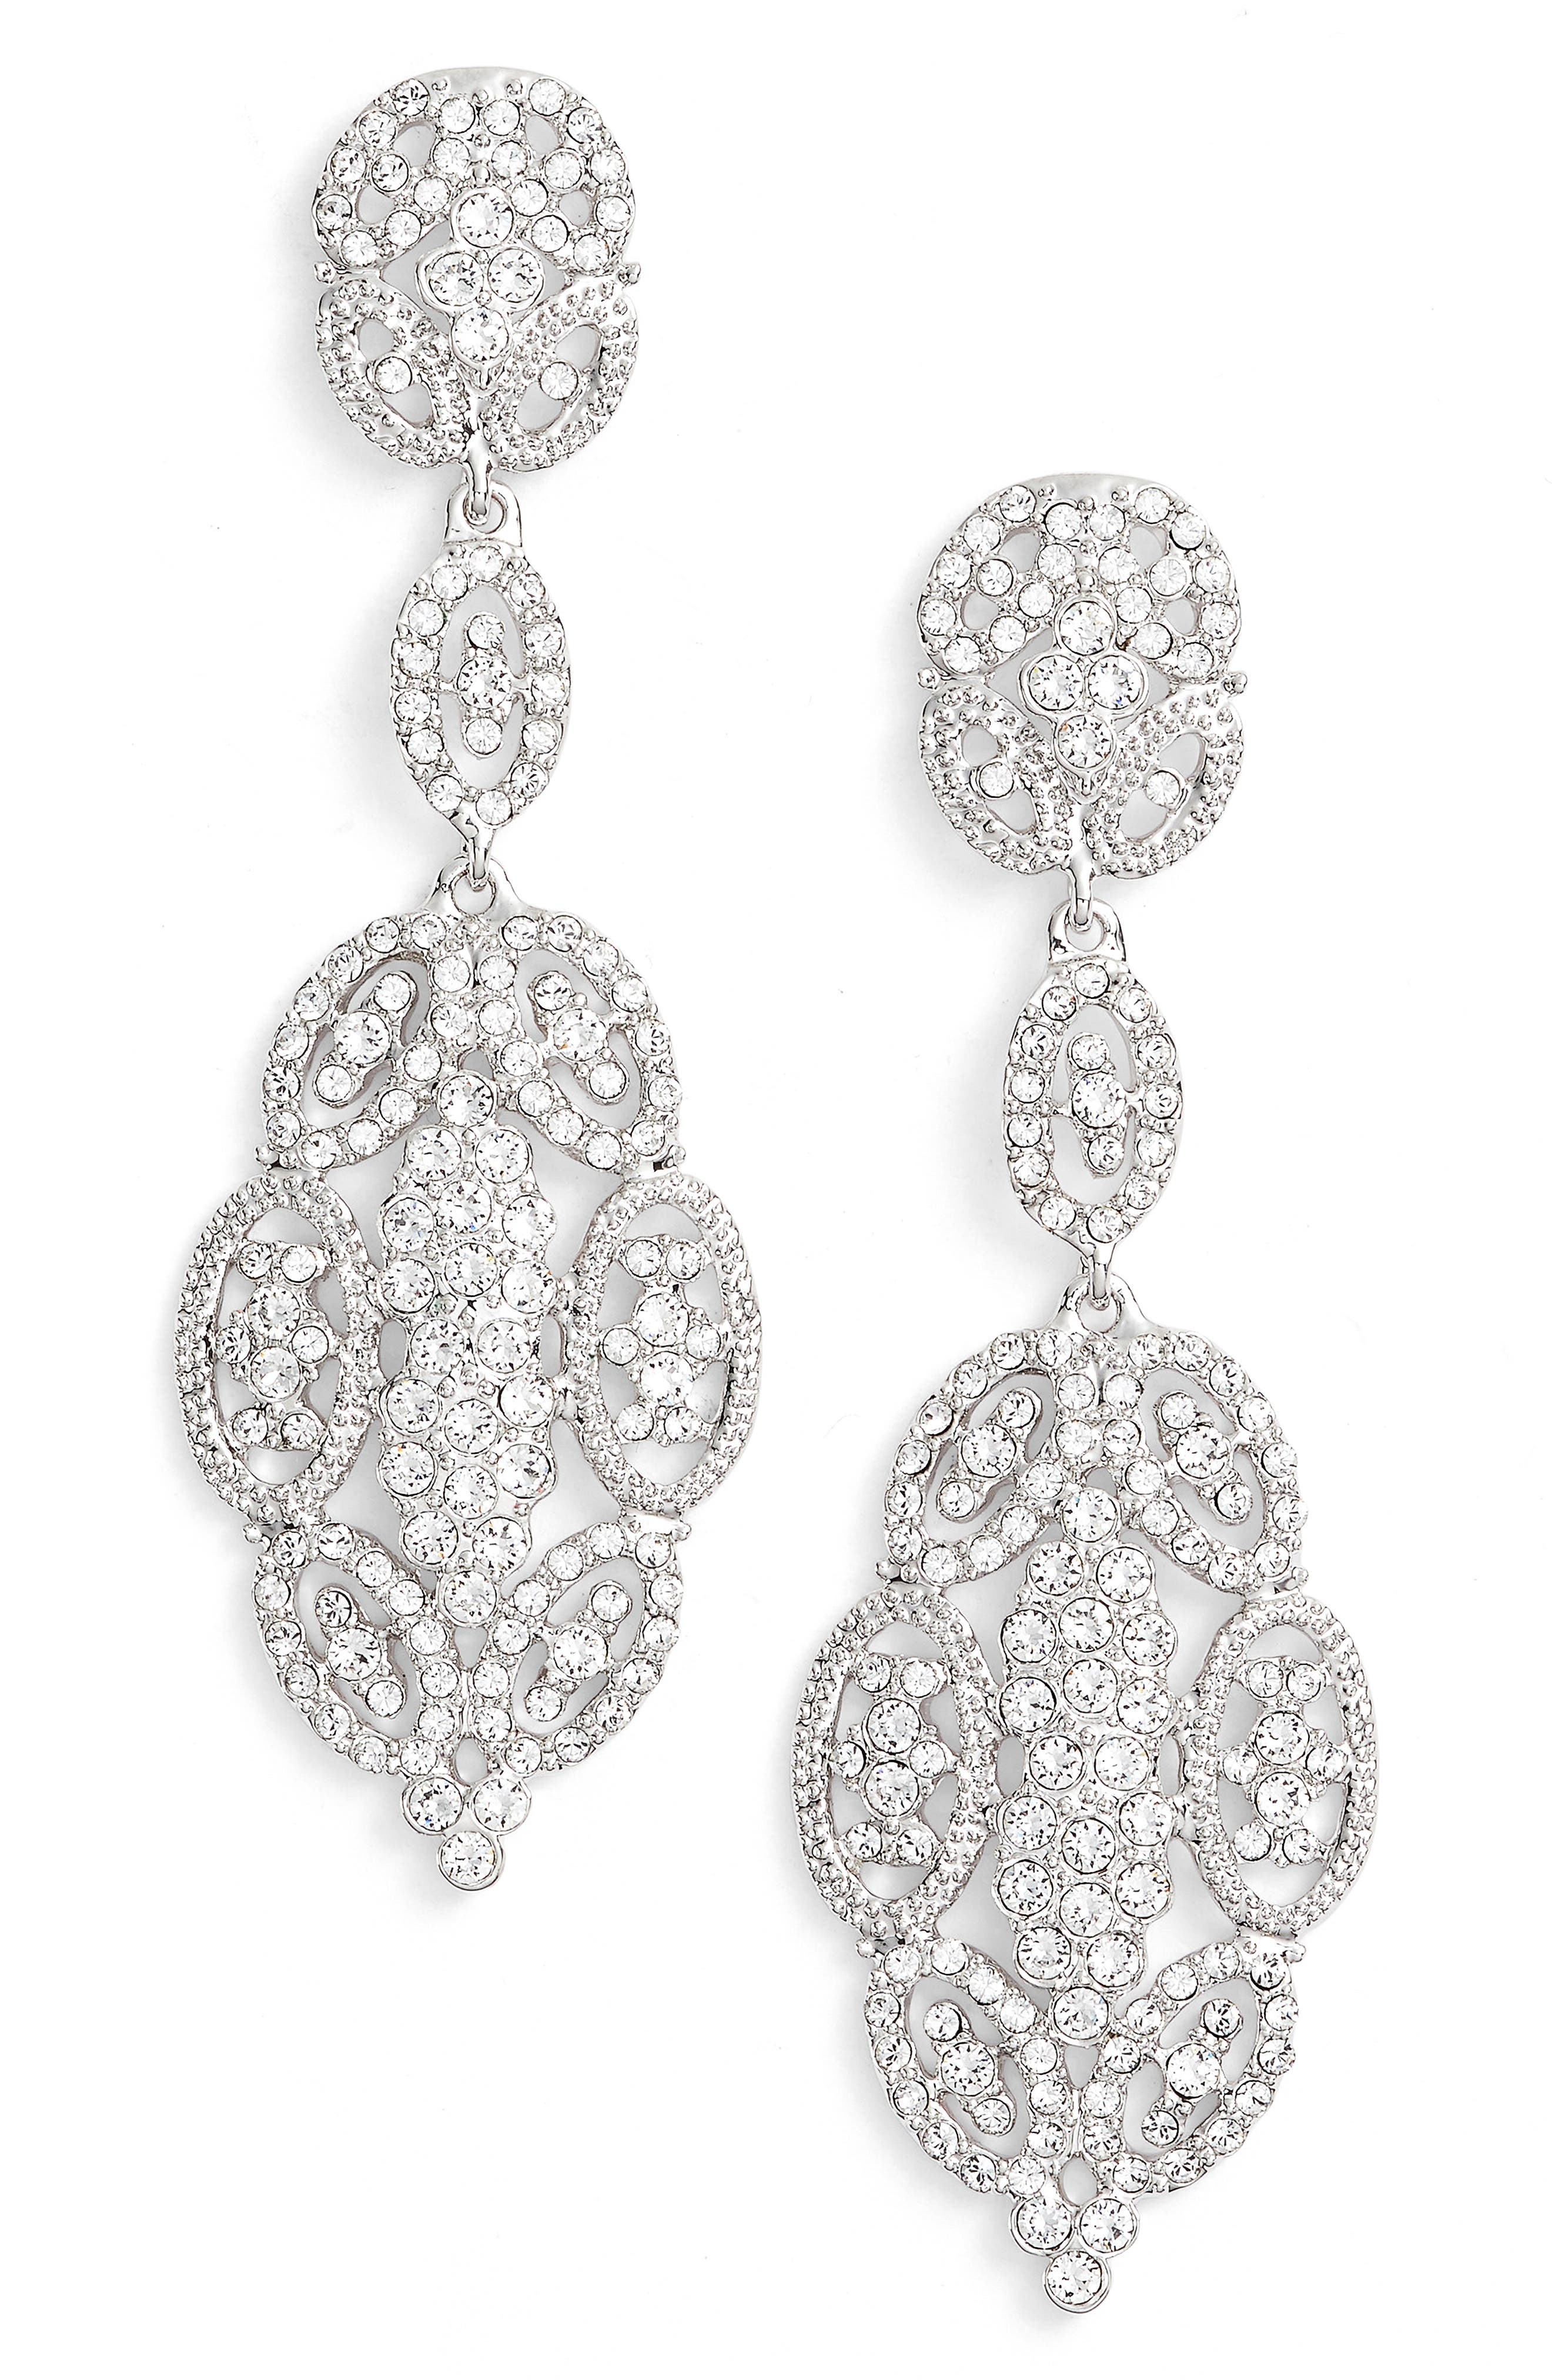 'Glamorous' Crystal Drop Earrings,                             Main thumbnail 1, color,                             Silver